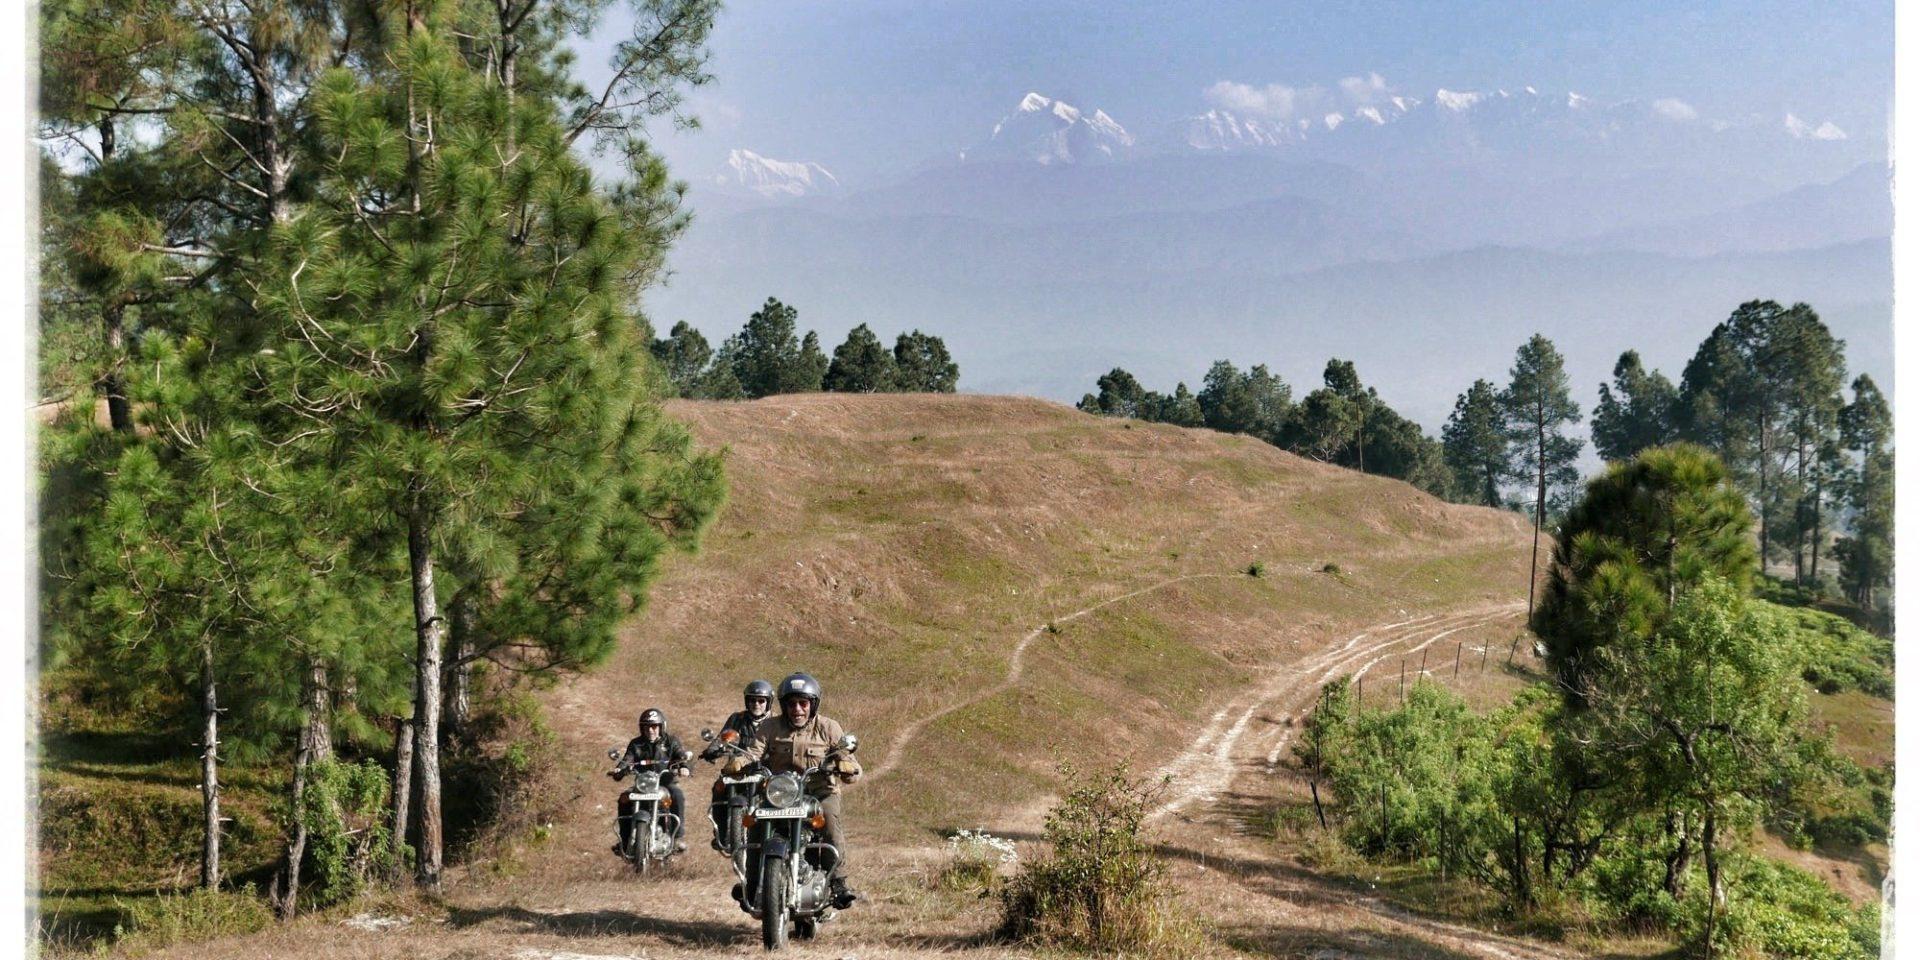 Motorrad-Roadtrip Himalaya - Ursprünge des Hinduismus